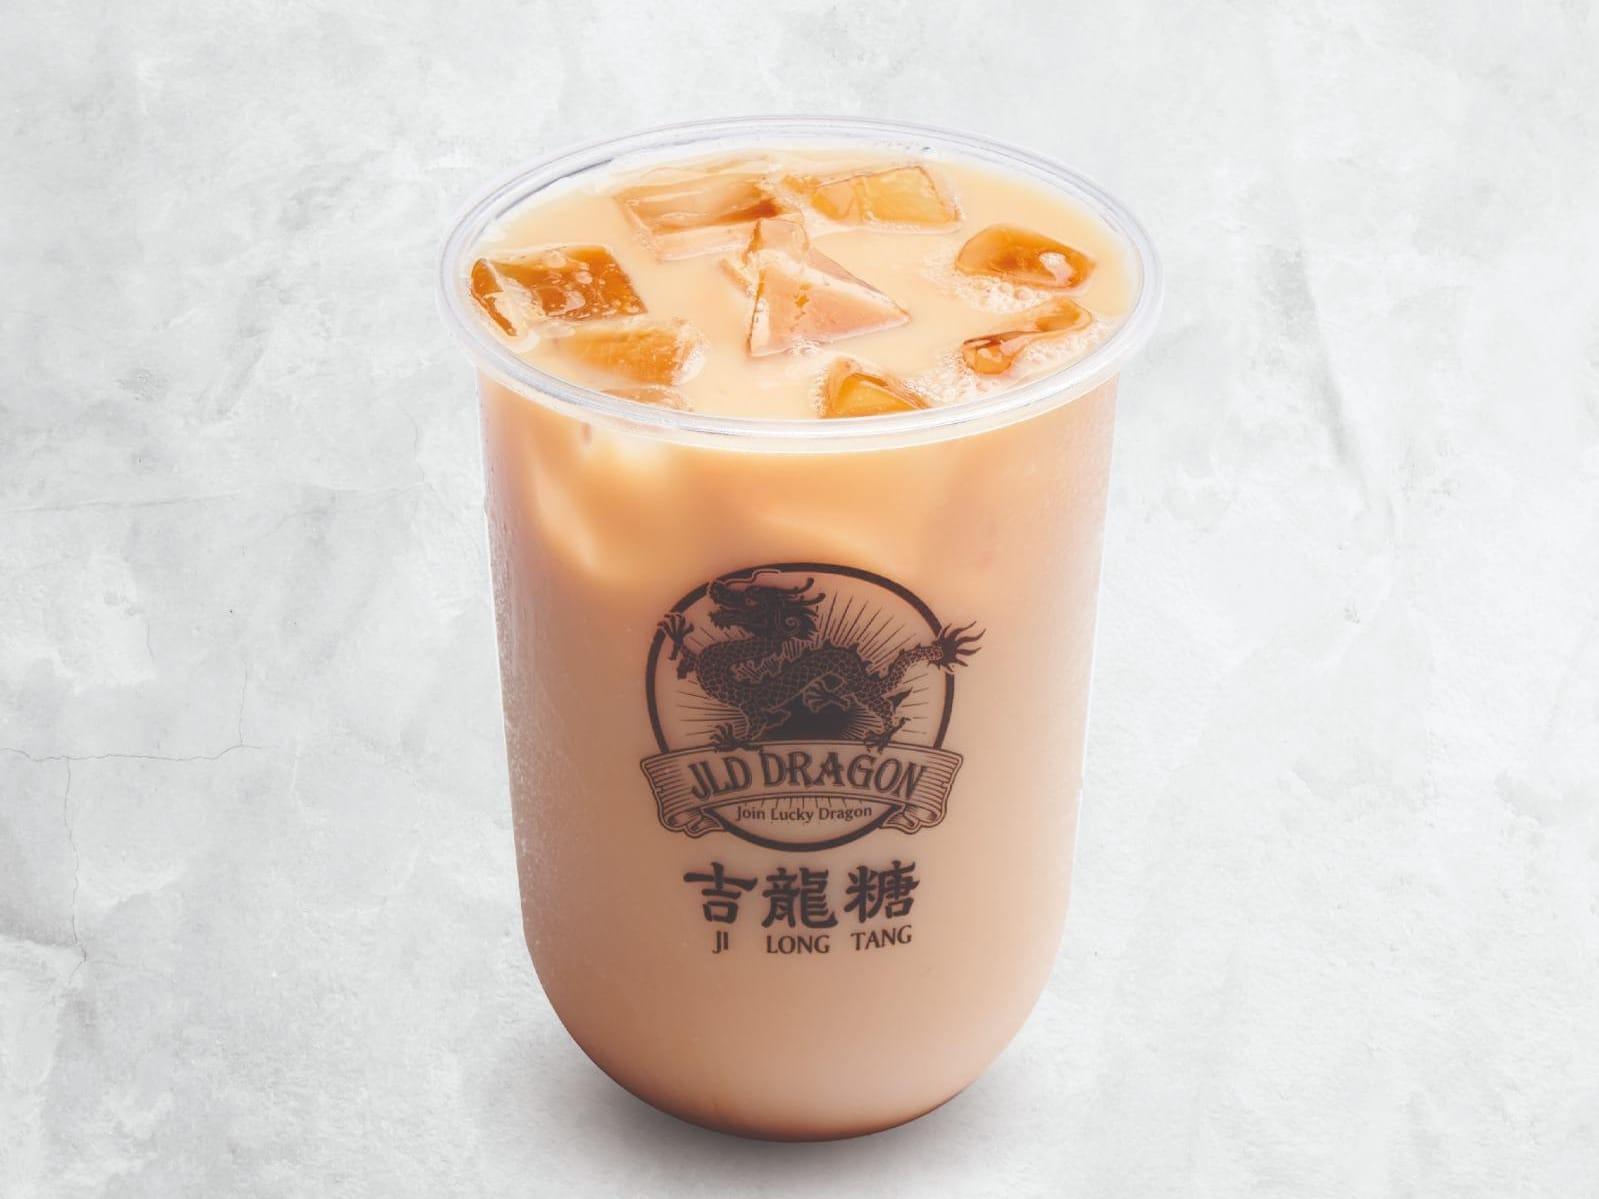 1 x Tie Guan Yin Fresh Milk Tea